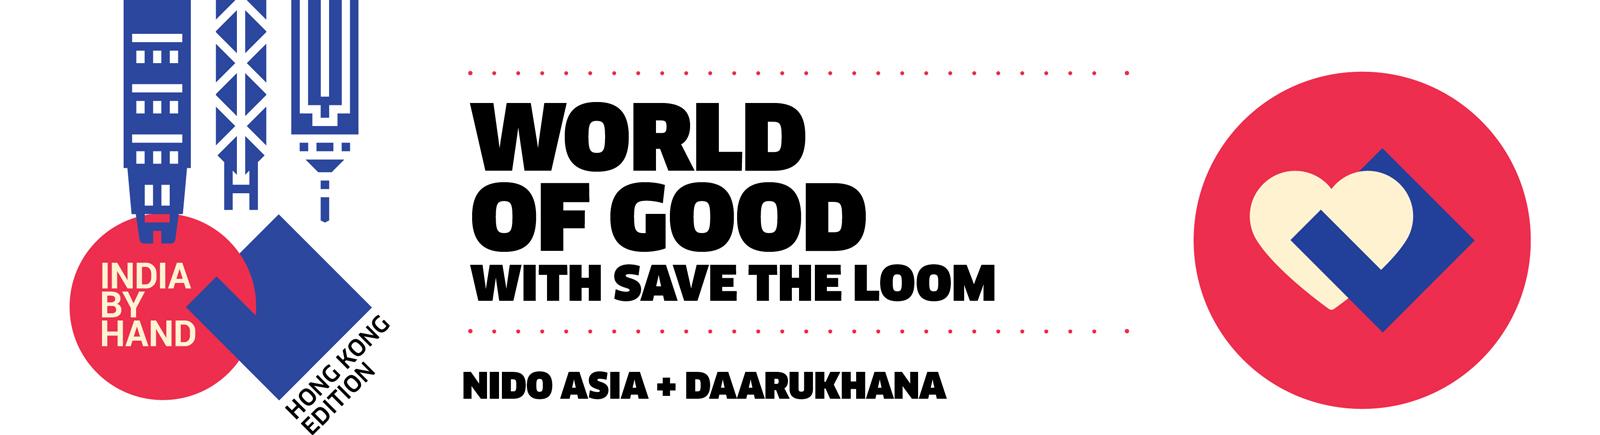 World-of-Good-01.jpg